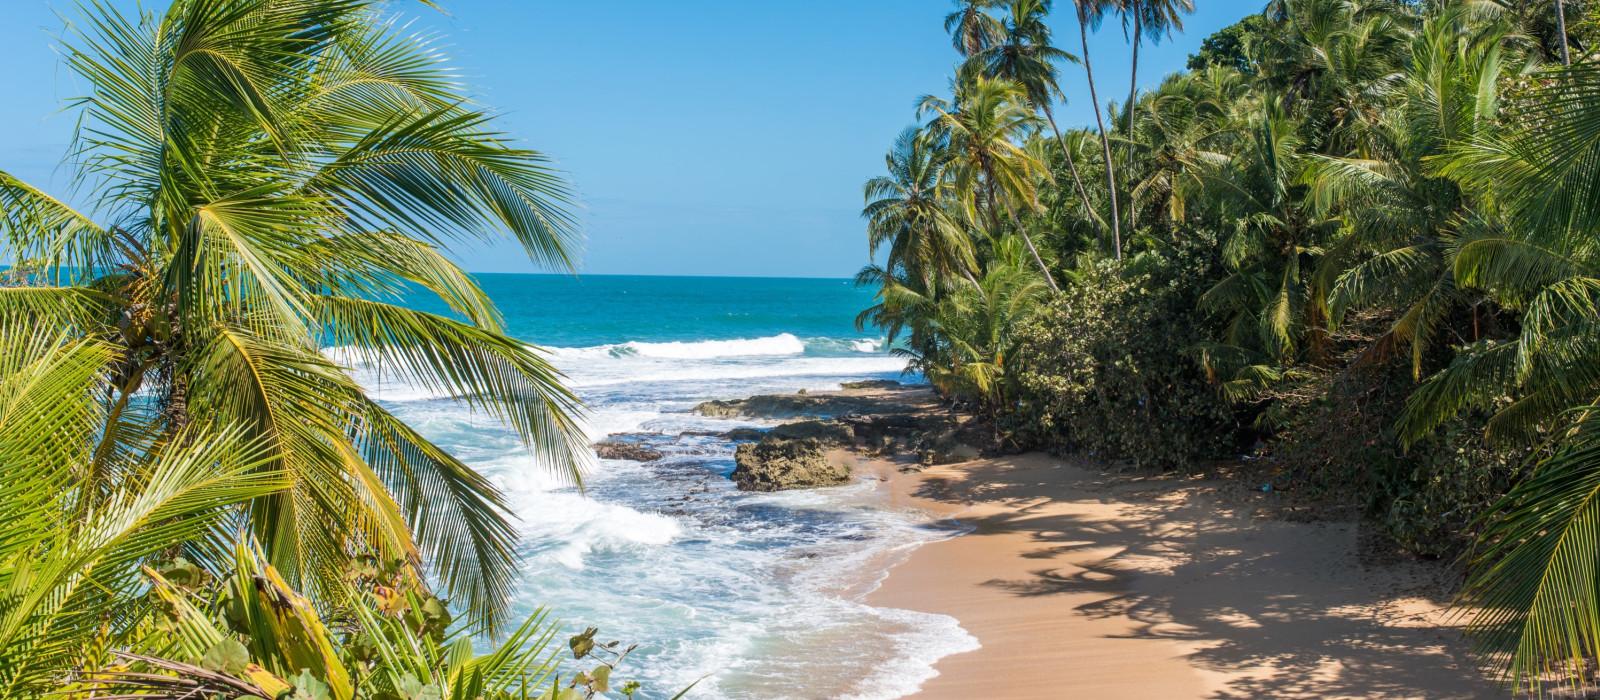 Reiseziel Puerto Viejo Costa Rica